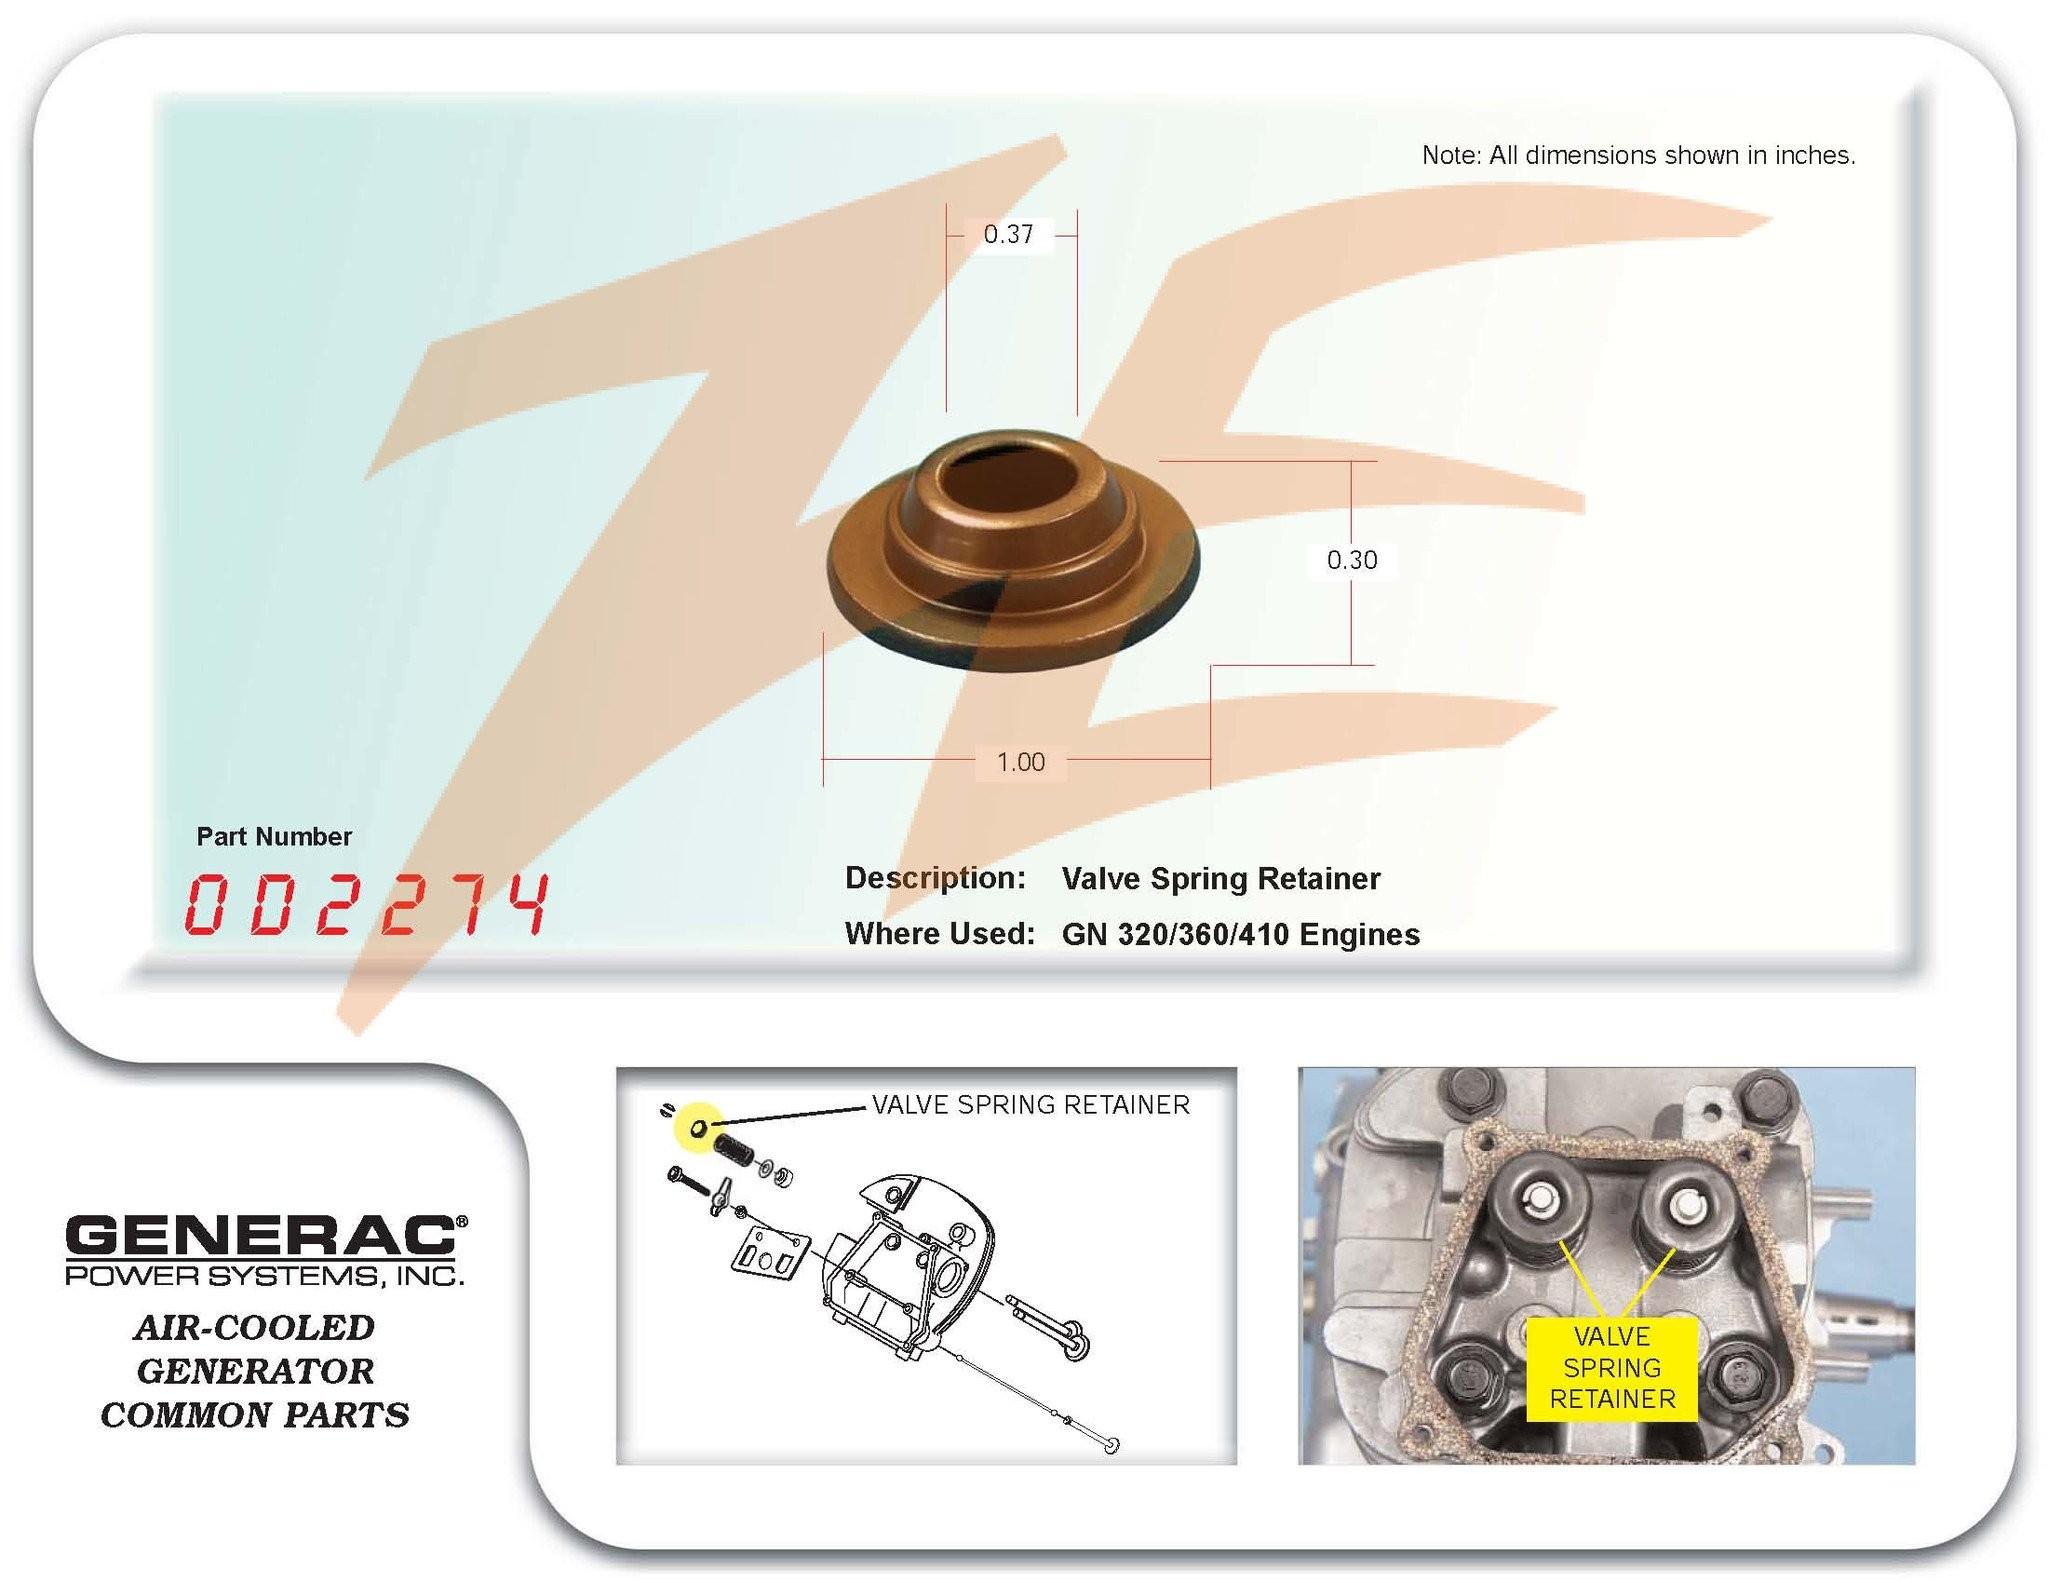 Air Cooled Engine Diagram Generac 0d2274 Valve Spring Retainer 320 360 410cc Engines – Ziller Of Air Cooled Engine Diagram